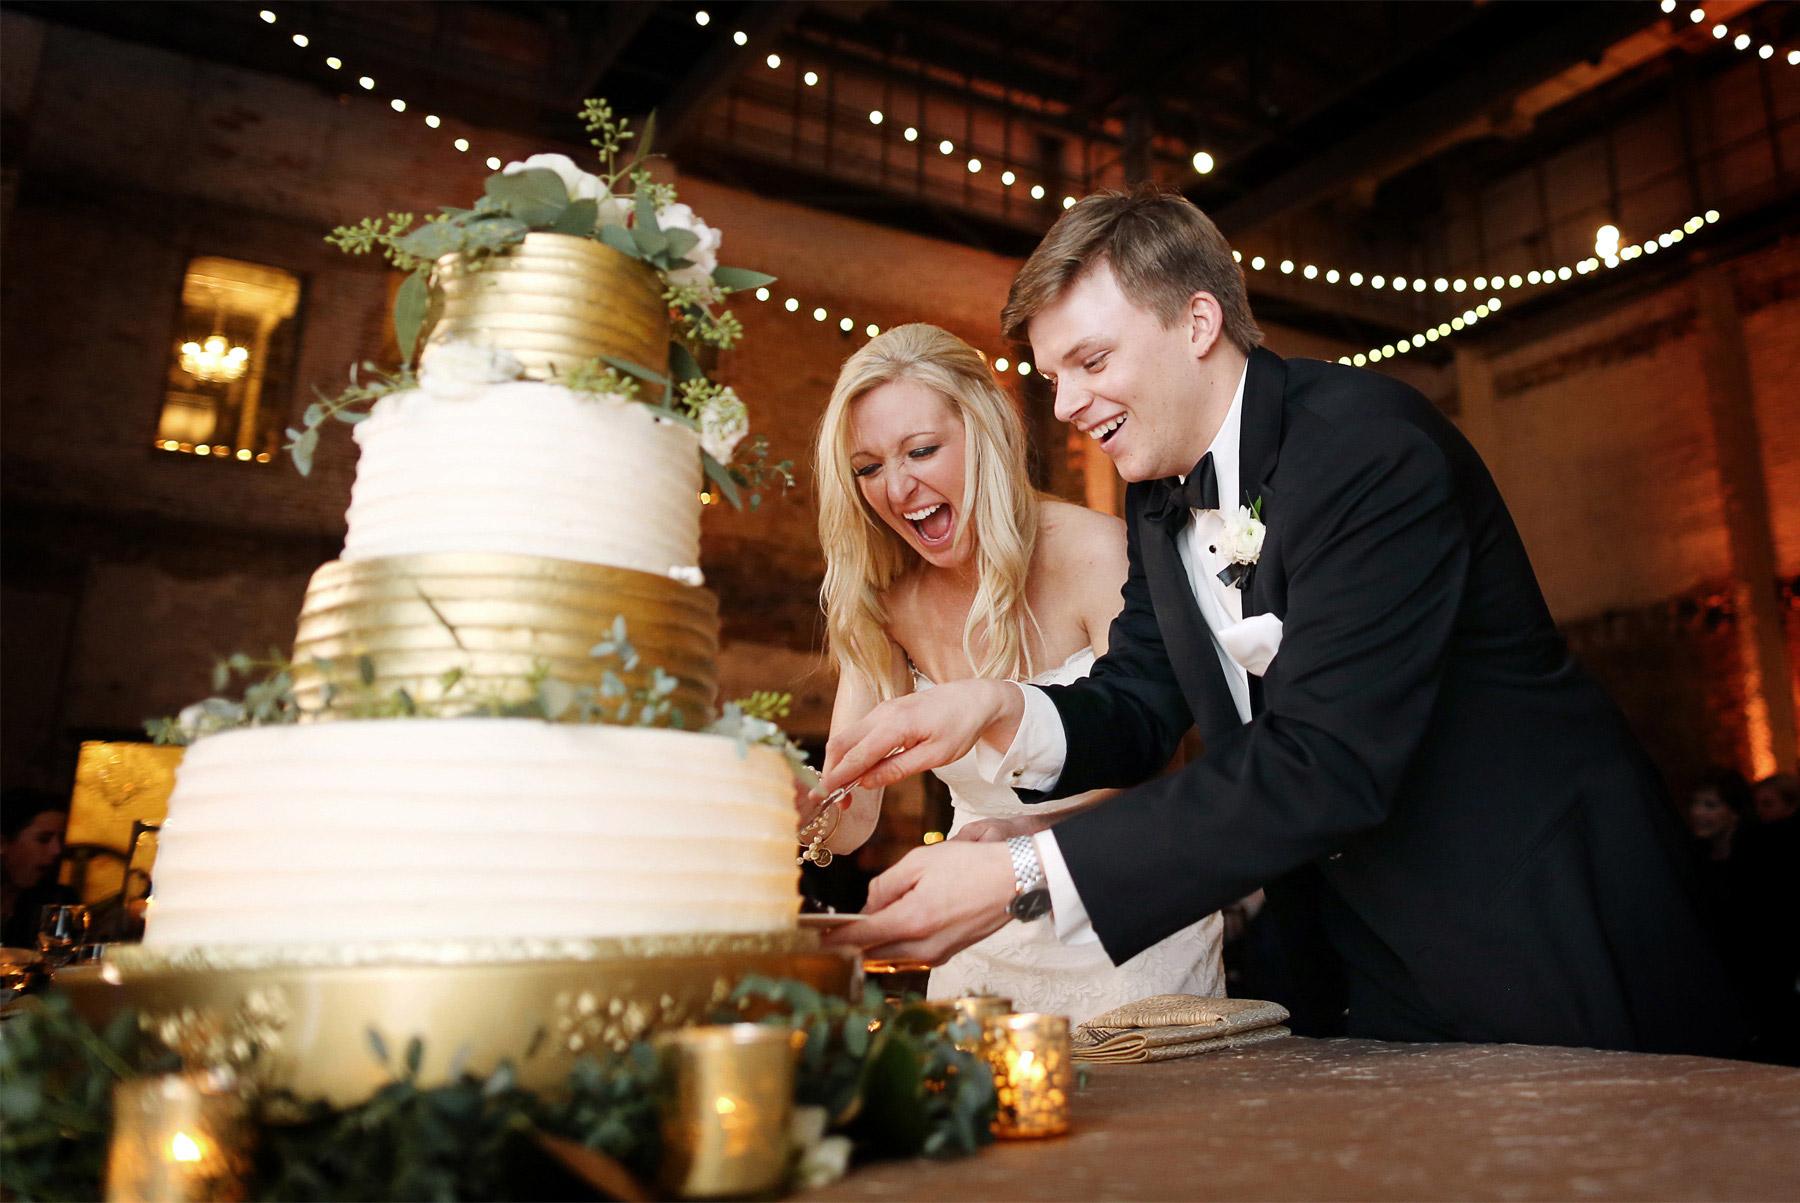 18-Minneapolis-Minnesota-Wedding-Photography-by-Vick-Photography-Aria-Cake-Cutting-Reception-Caroline-and-J.jpg